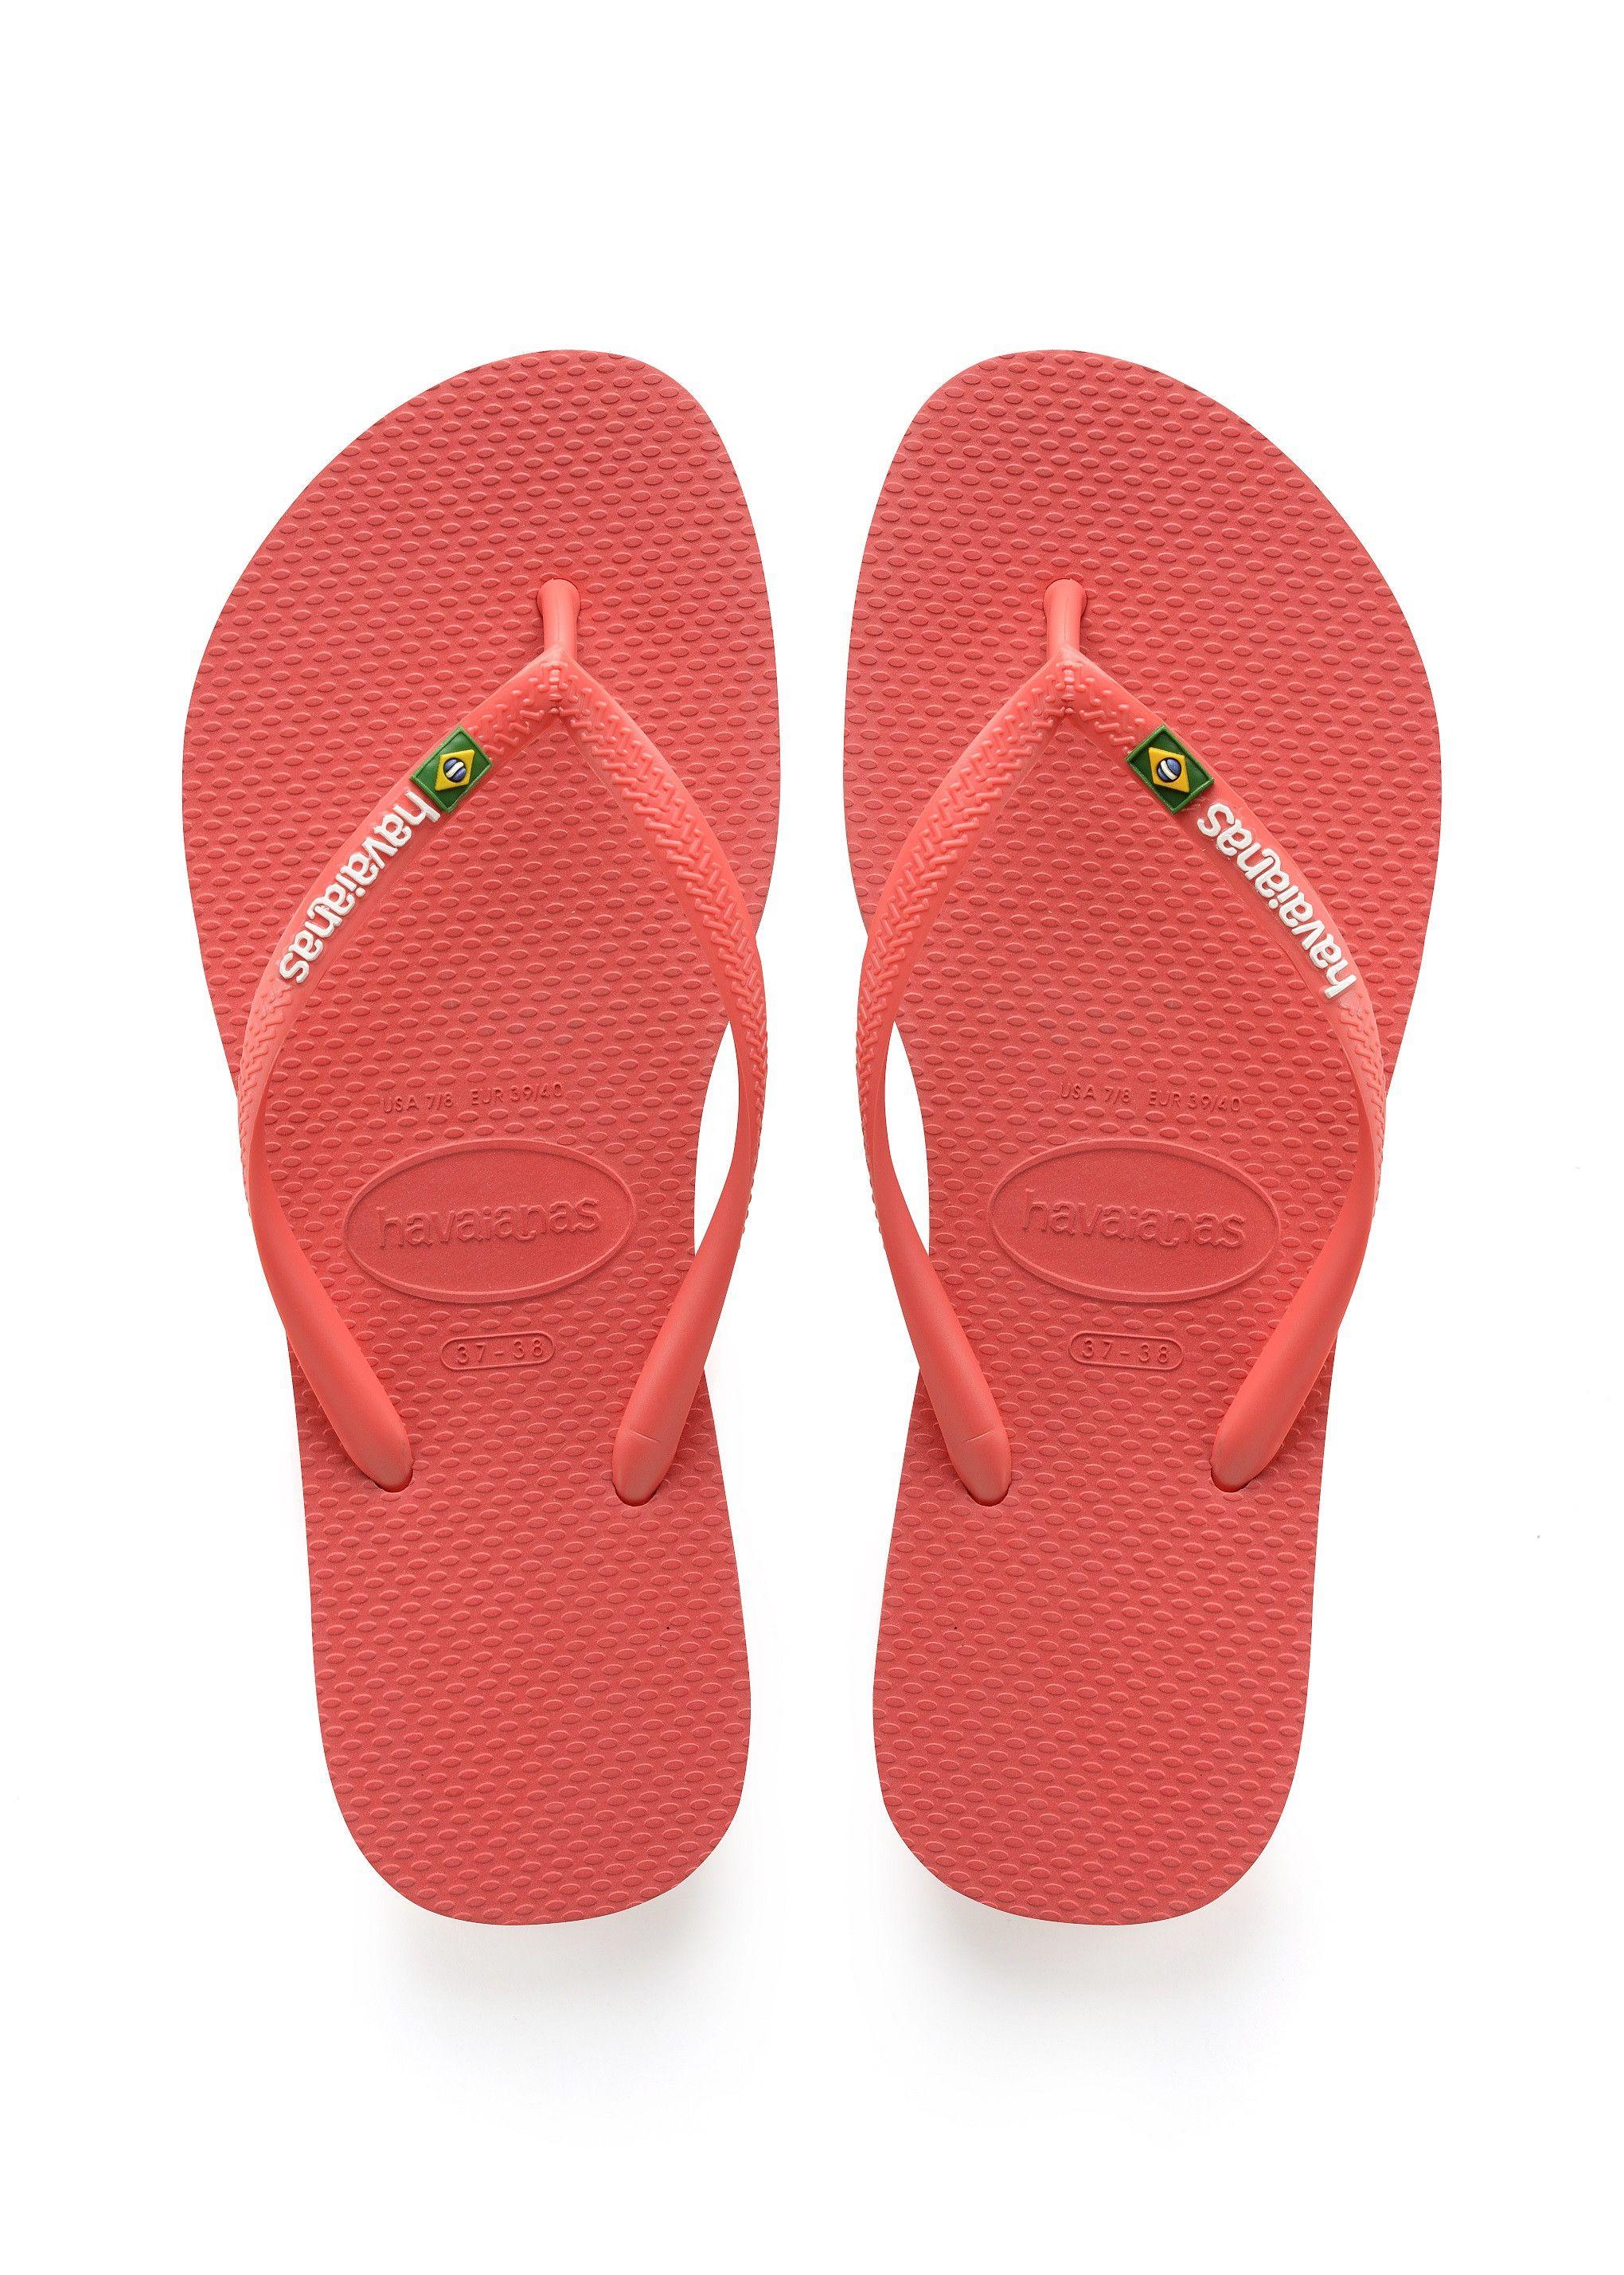 0580bc853b12 Havaianas Slim Brazil Sandal Coral Price From  35